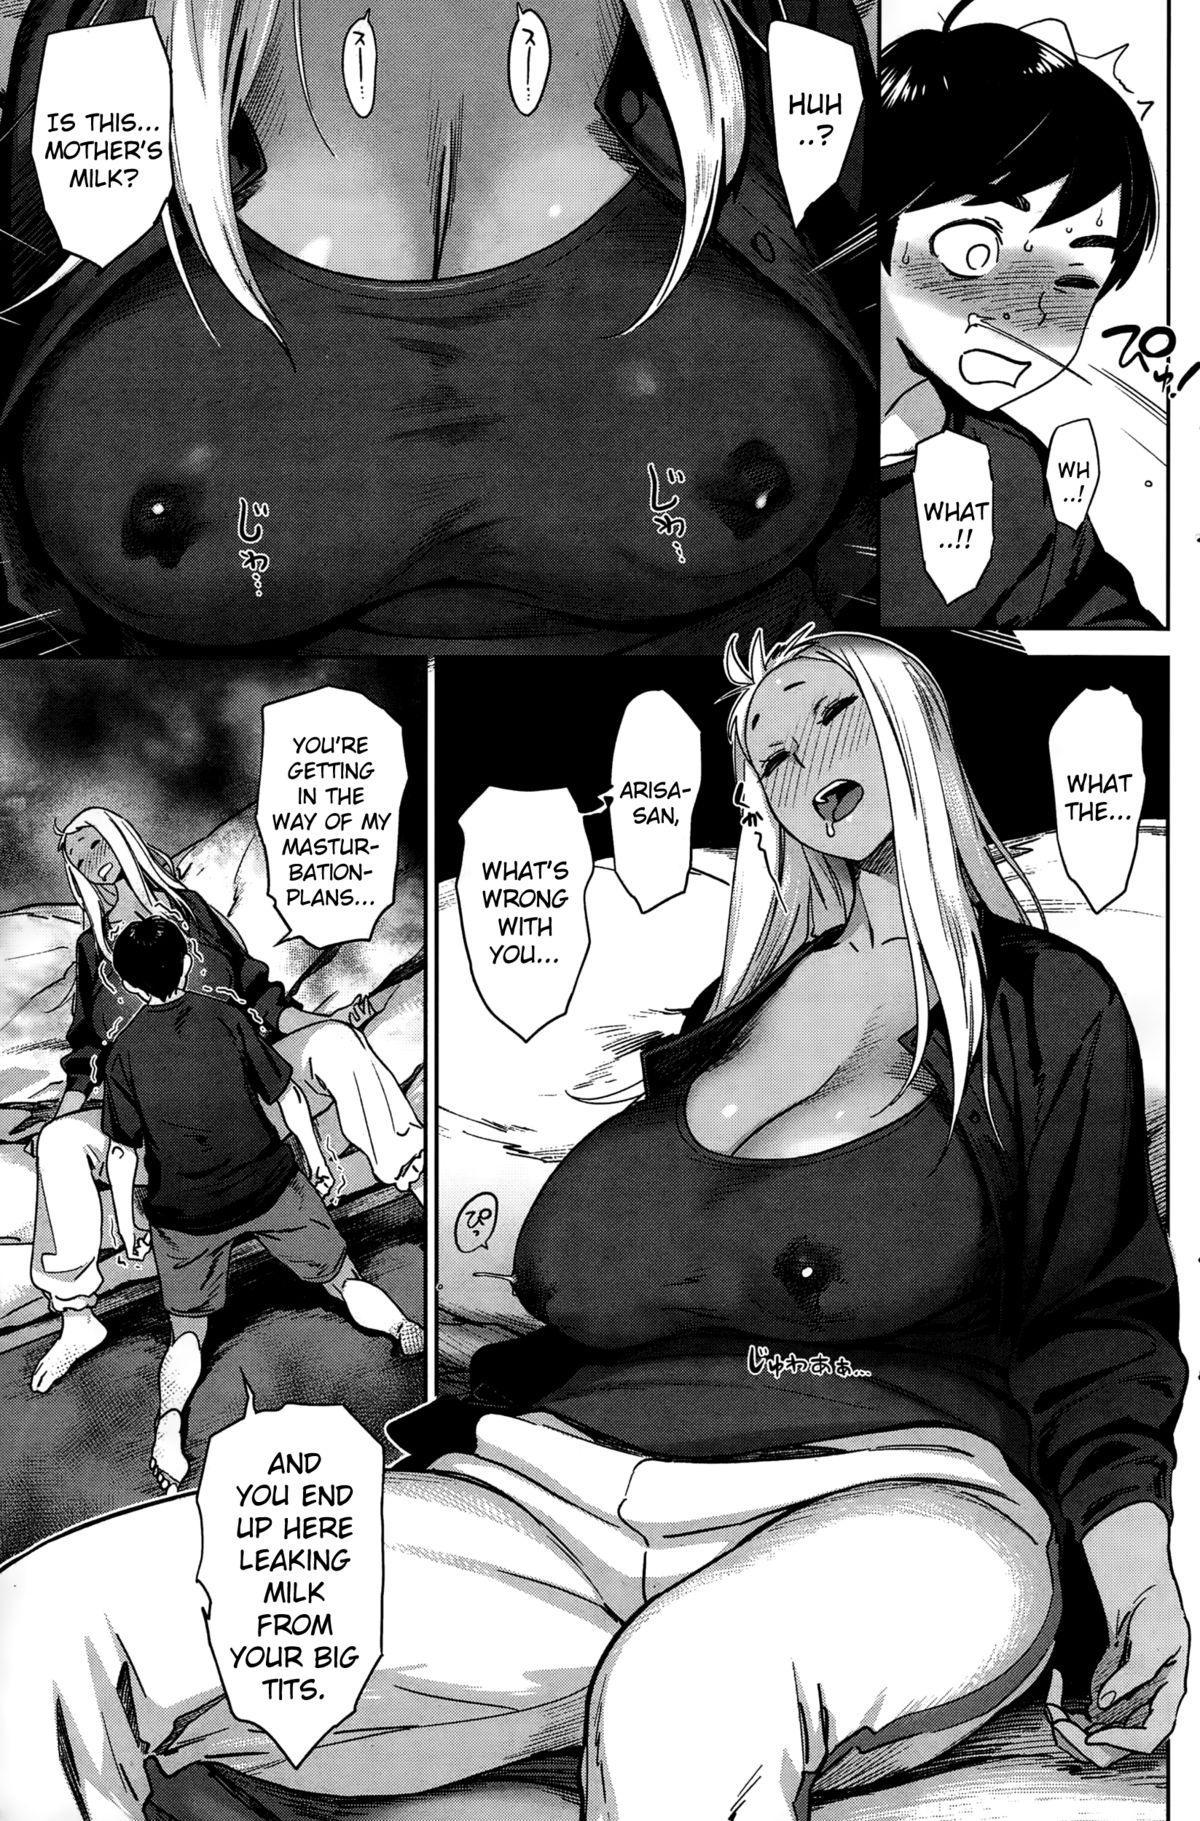 [Bobobo] Aniyome Milk | Elder Sister-in-Law's Milk! (COMIC Shitsurakuten 2014-12) [English] [Steven_Even] 4